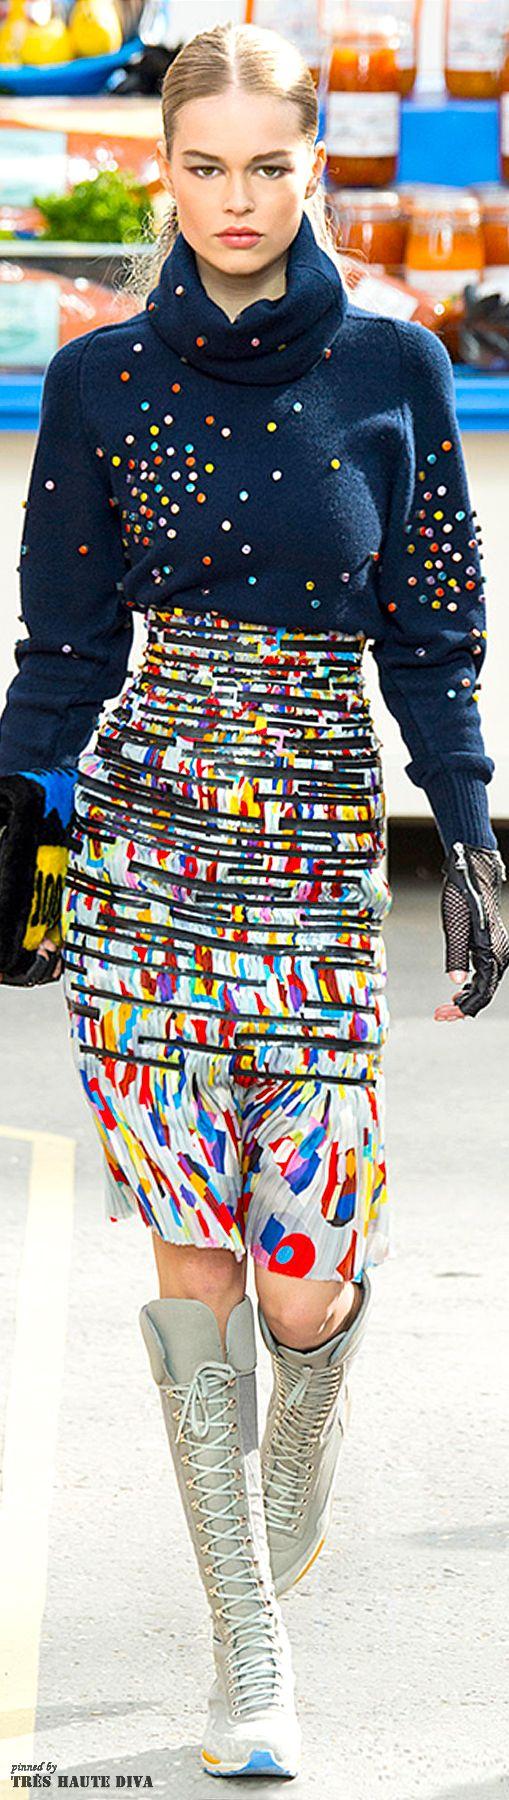 Paris Fashion Week #Chanel Fall/Winter 2014 RTW